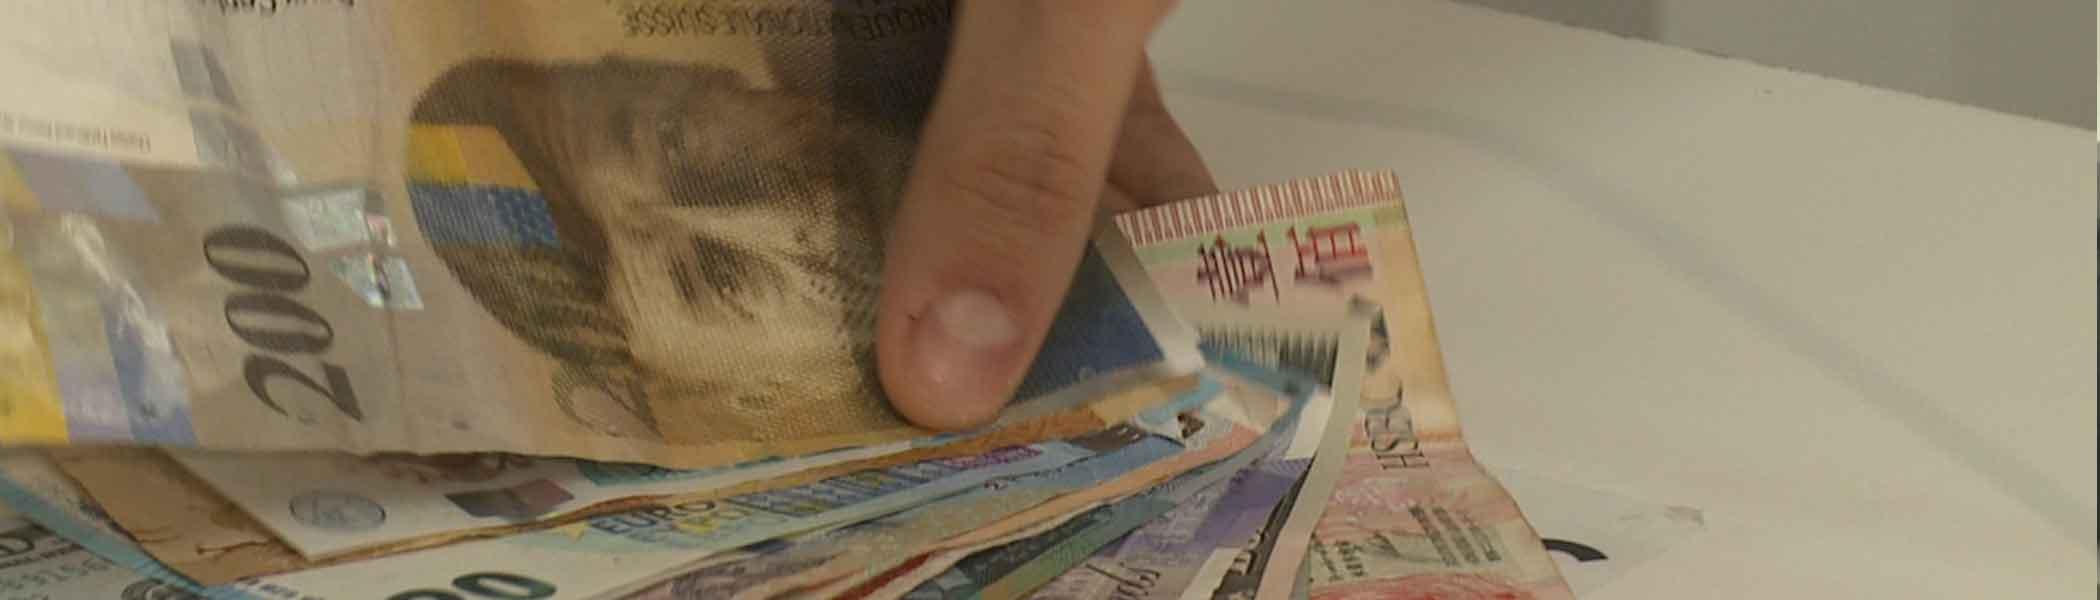 jpl-exchange-beau-vallon, Money changers in Seychelles Islands